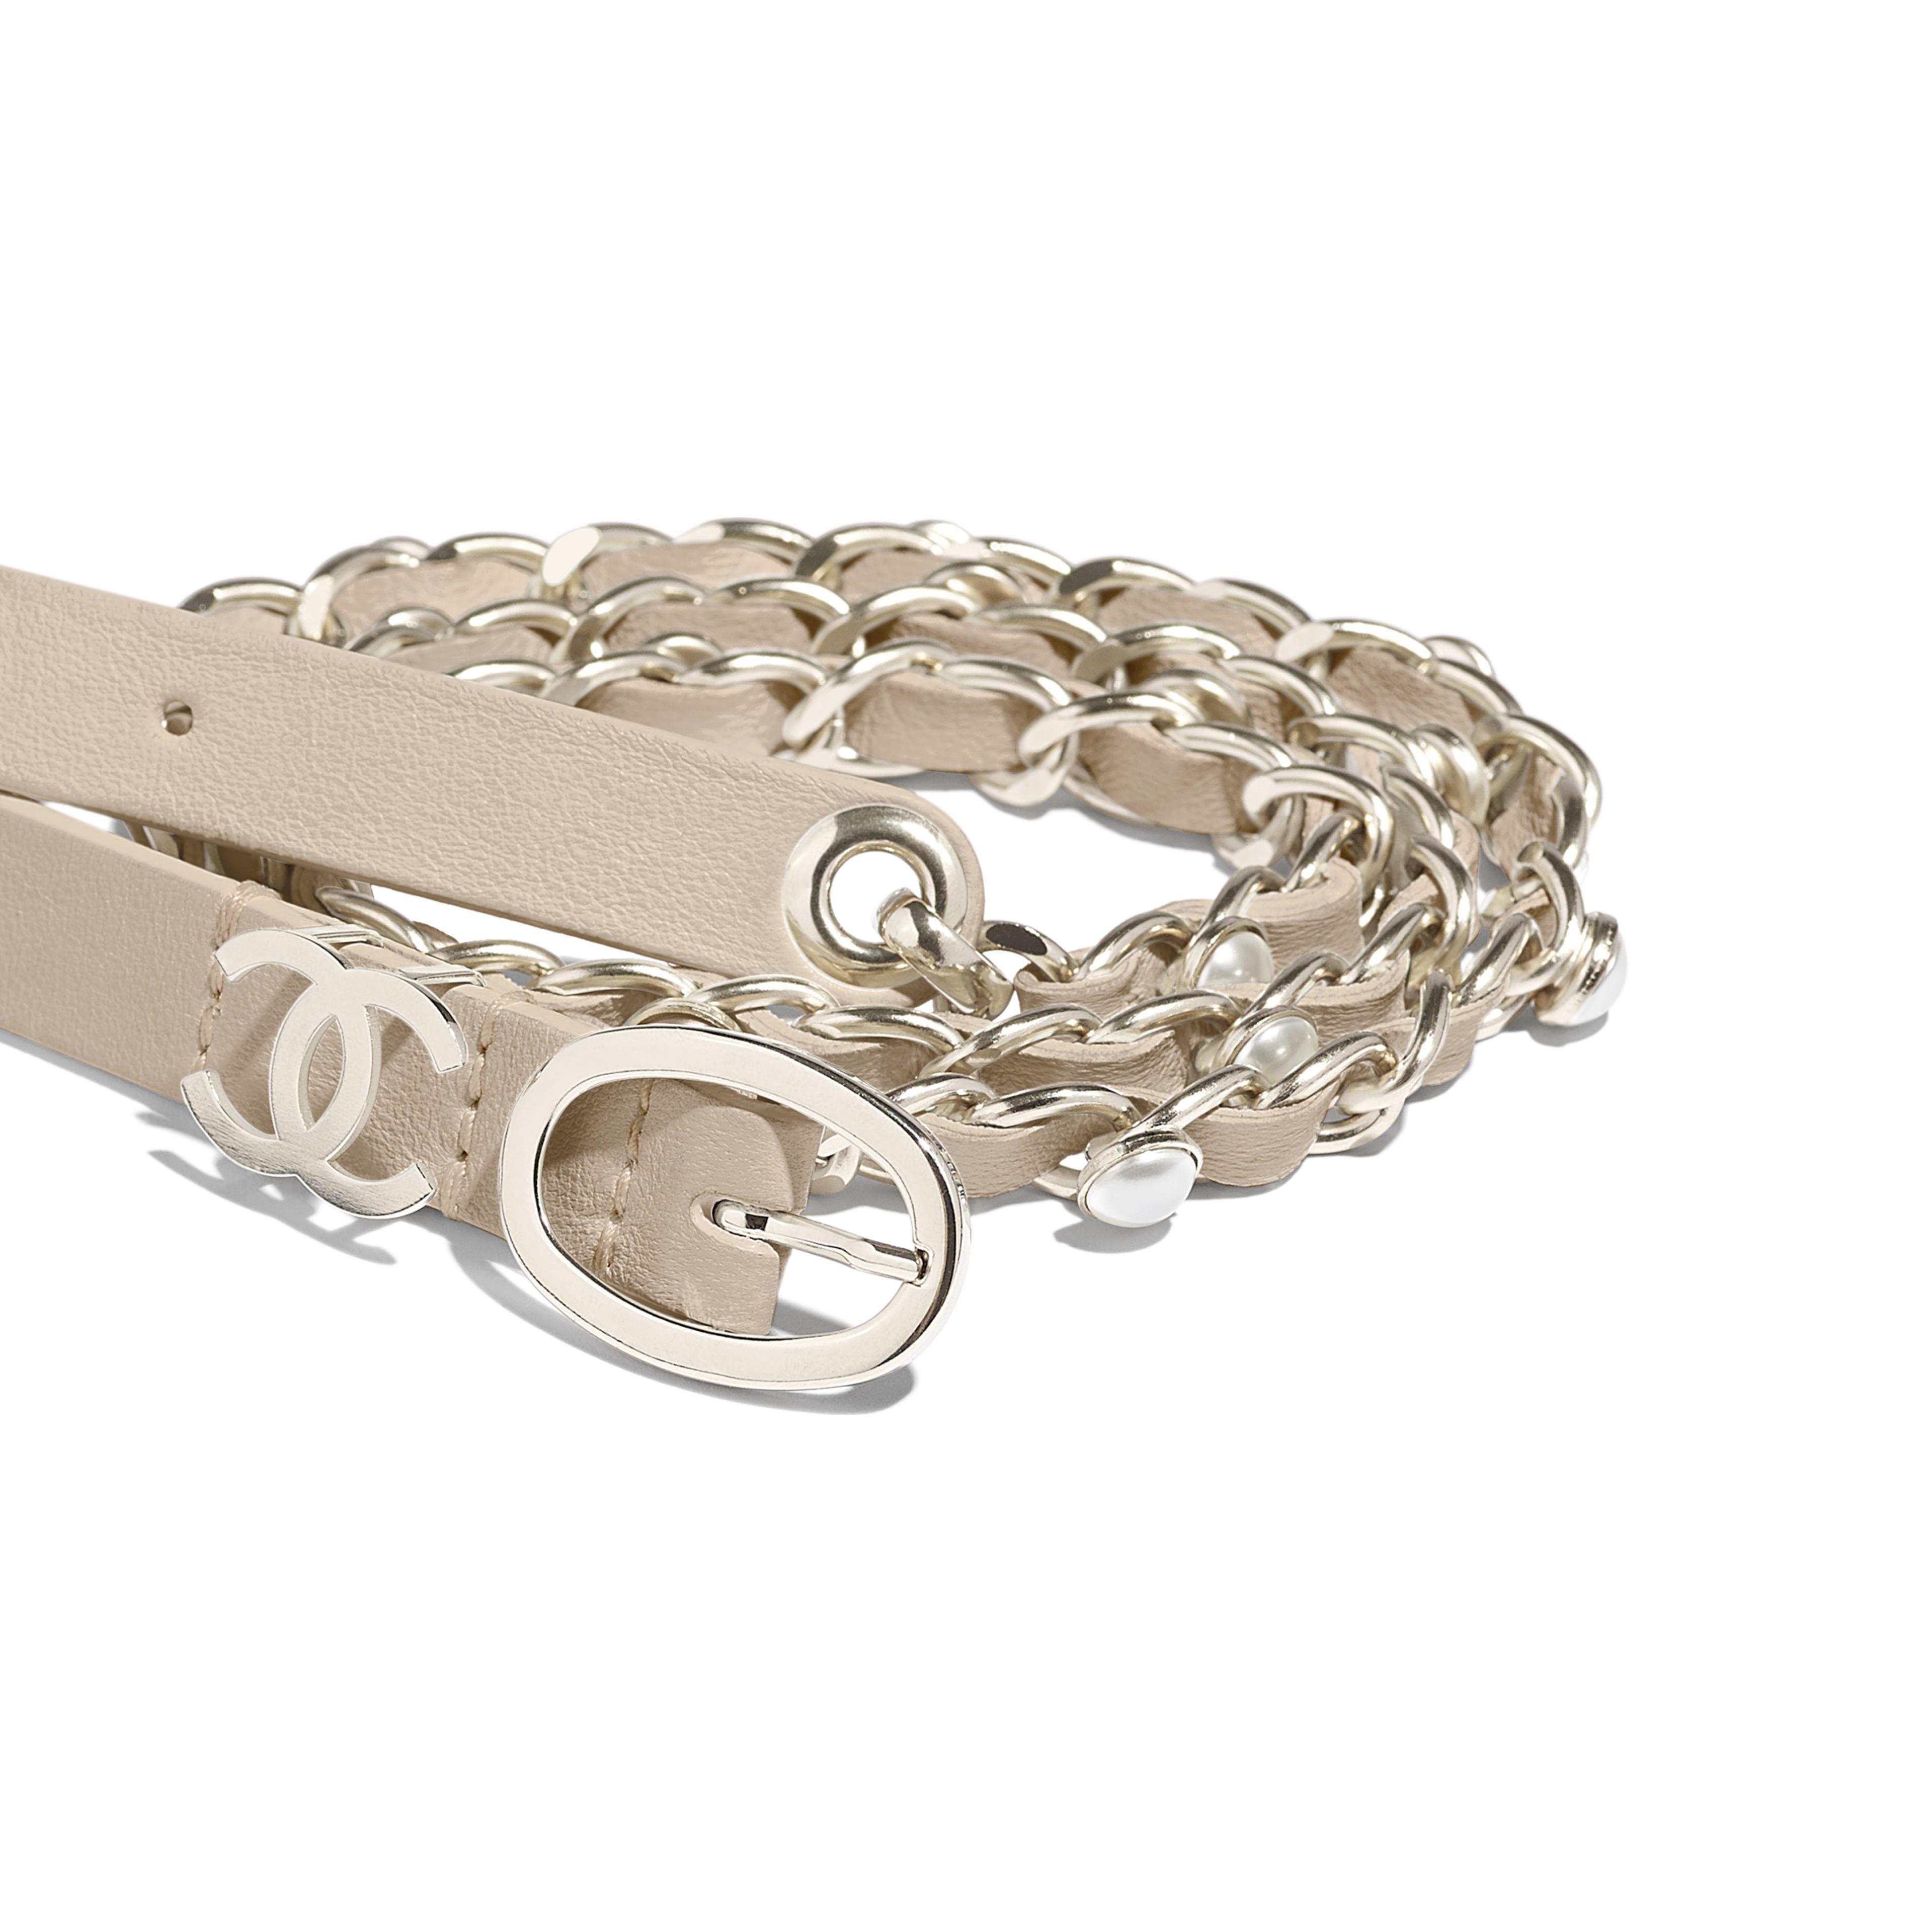 Belt - Beige - Lambskin, Gold-Tone Metal & Glass Pearls - Alternative view - see full sized version